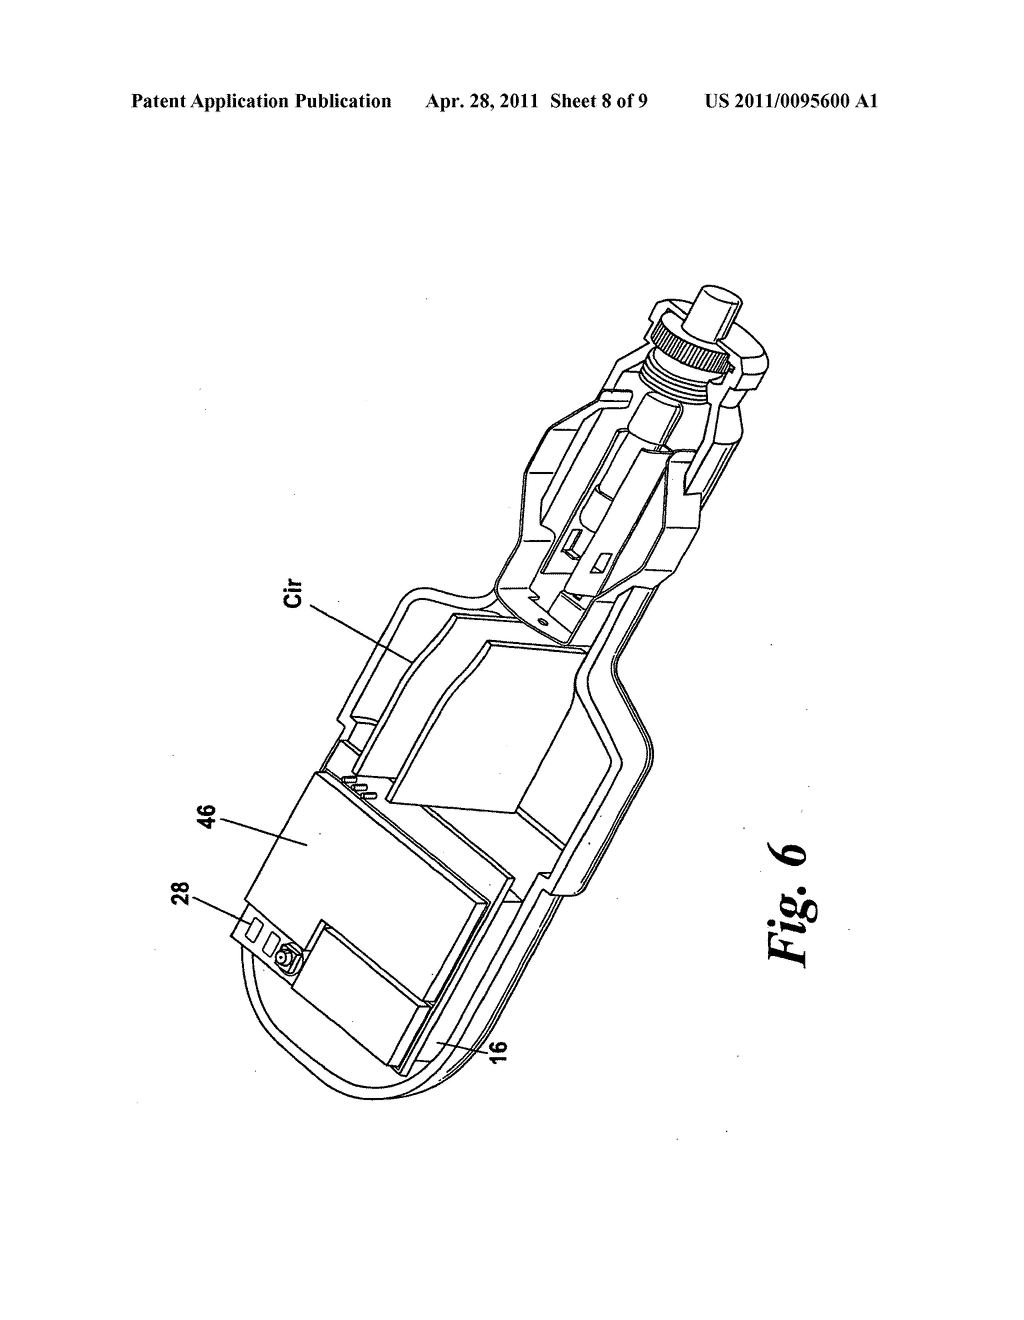 hight resolution of cigarette lighter schematic wiring diagram review car cigarette lighter schematic cigarette lighter schematic